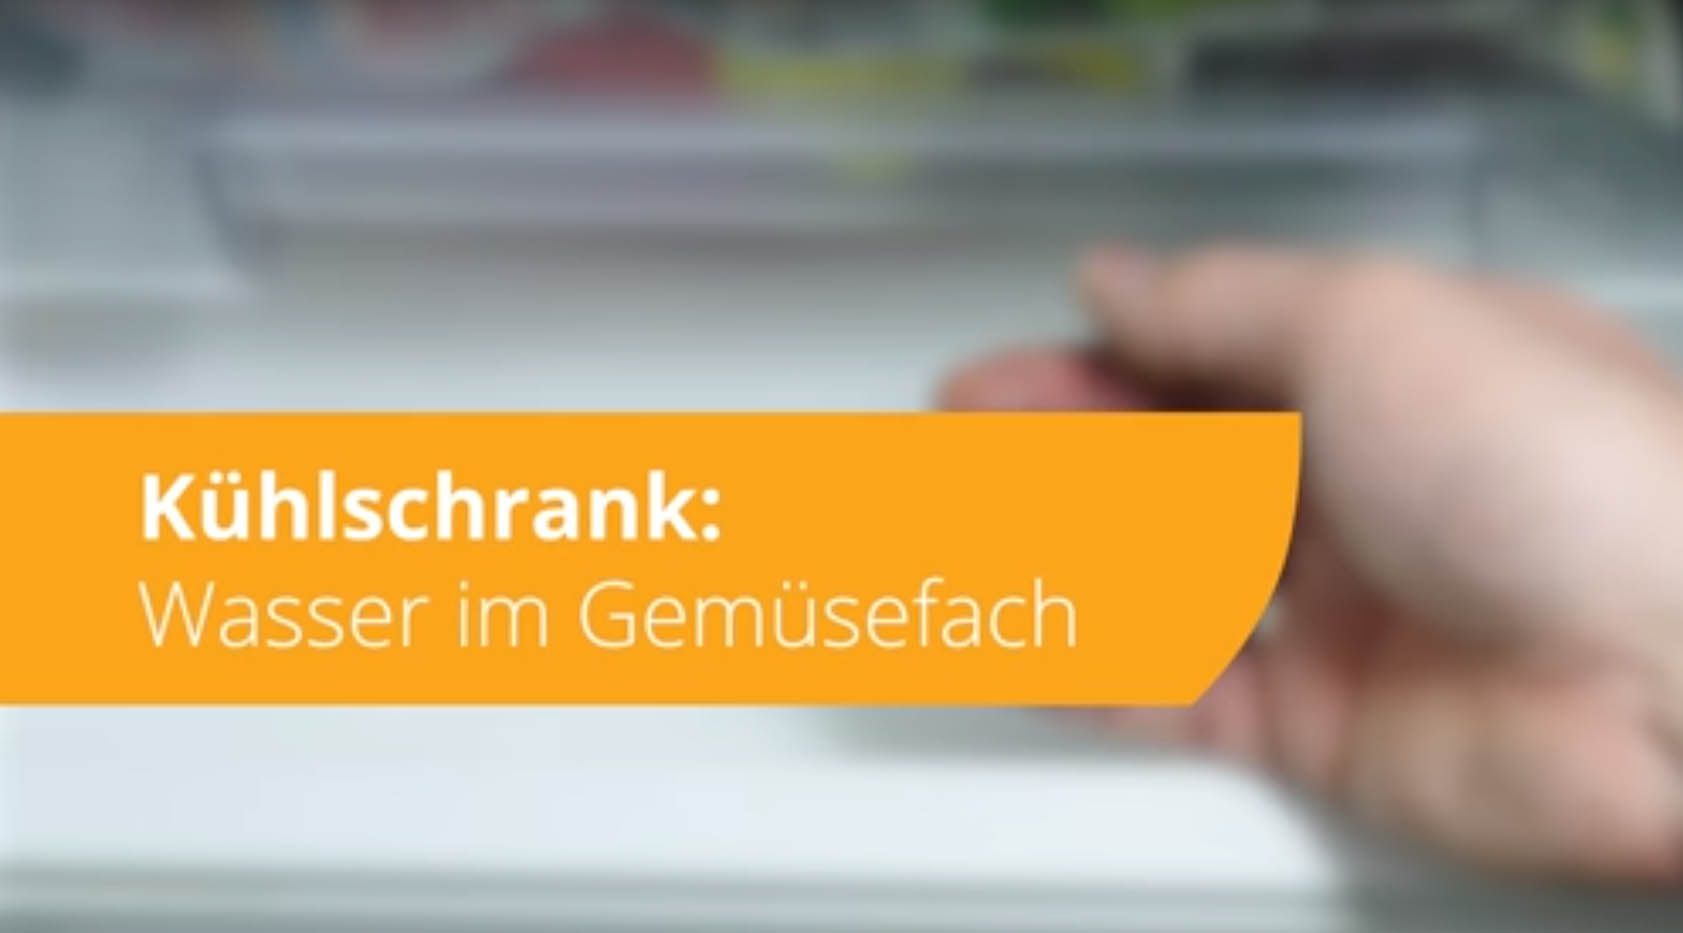 Siemens Kühlschrank Verliert Wasser : Smeg kühlschrank verliert wasser xavax kühlschrankthermometer